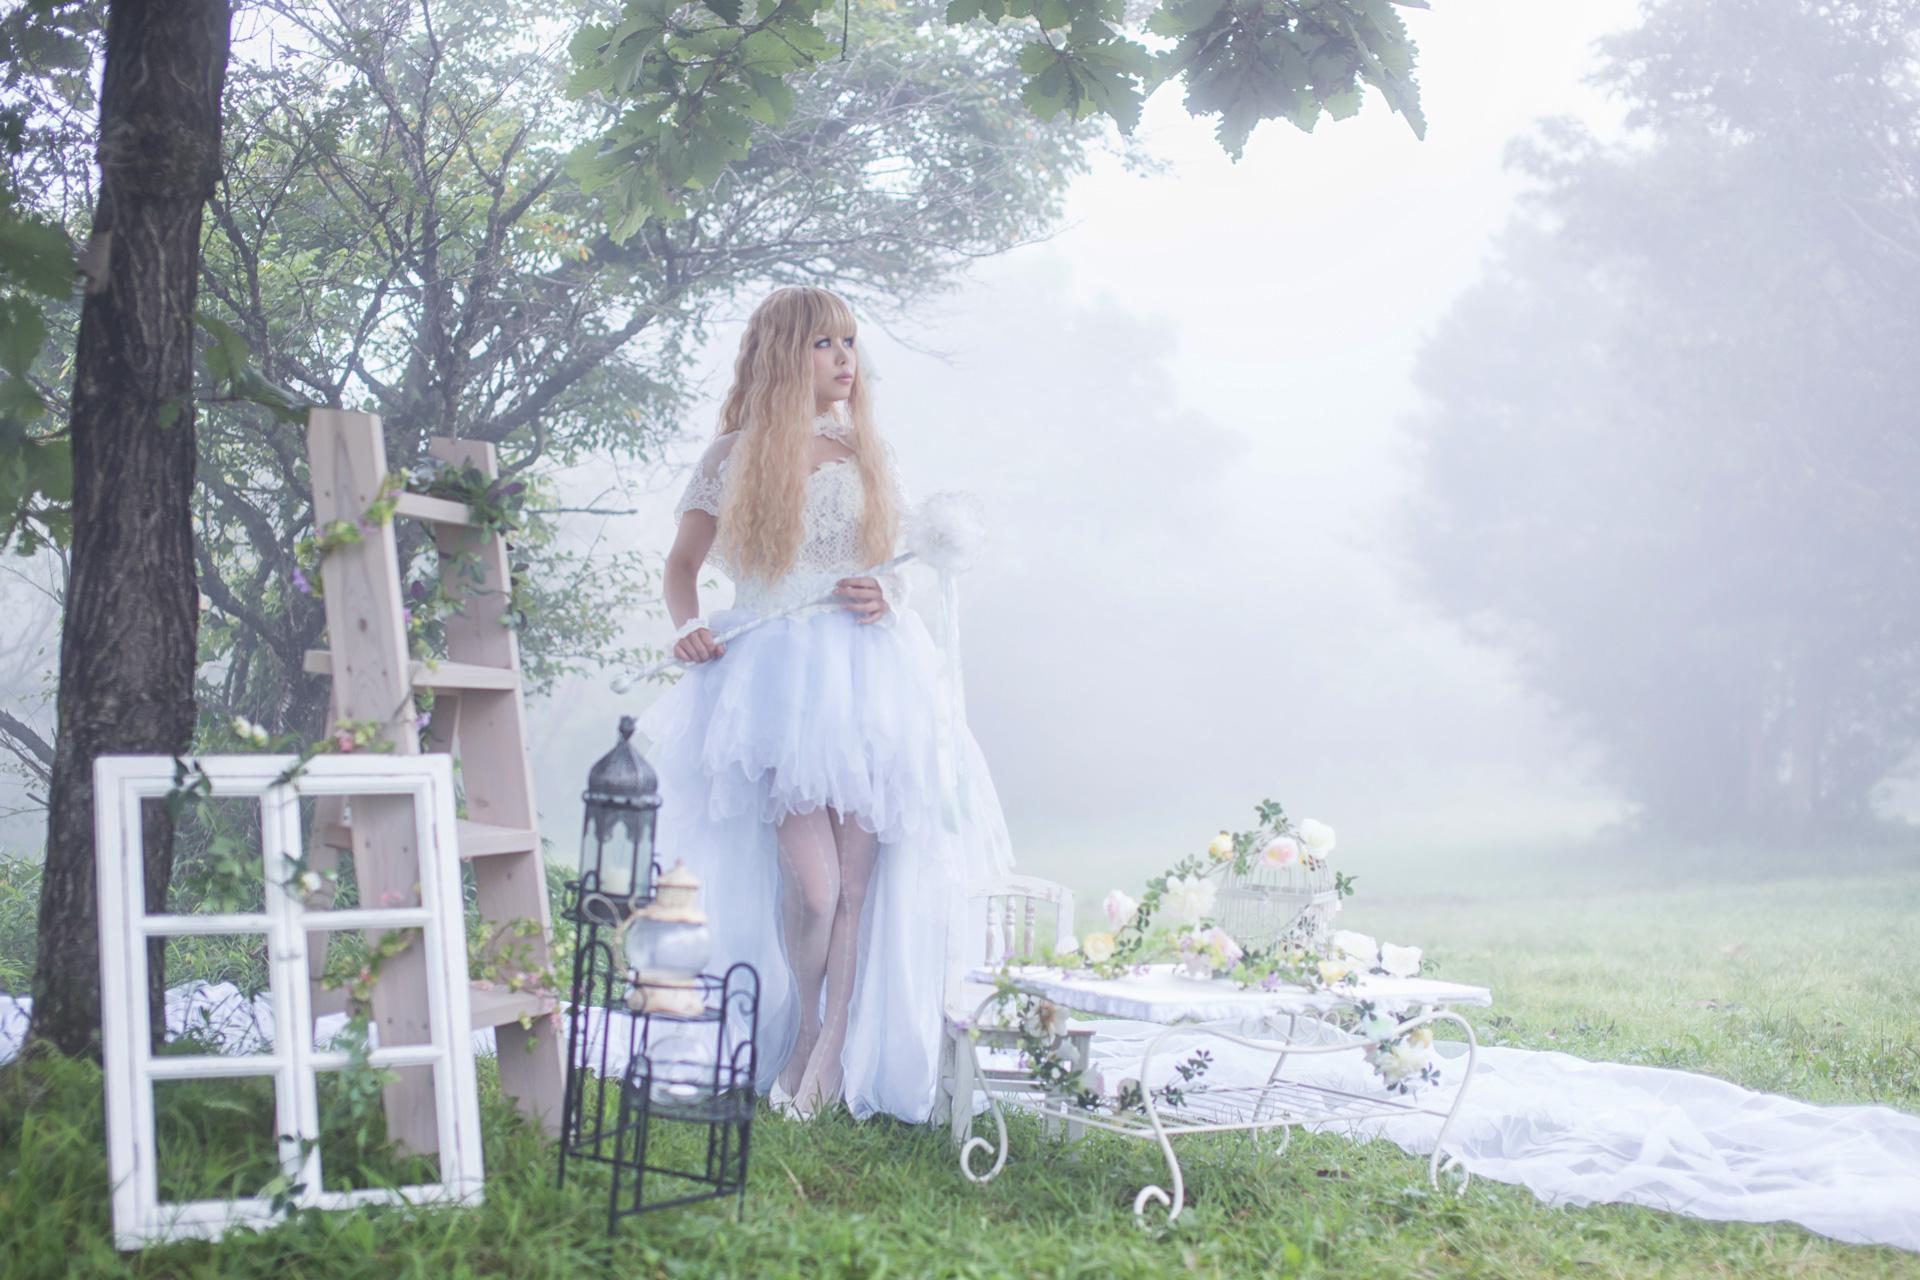 Mystic@オリジナル衣装 コスプレイヤー:弥生さん